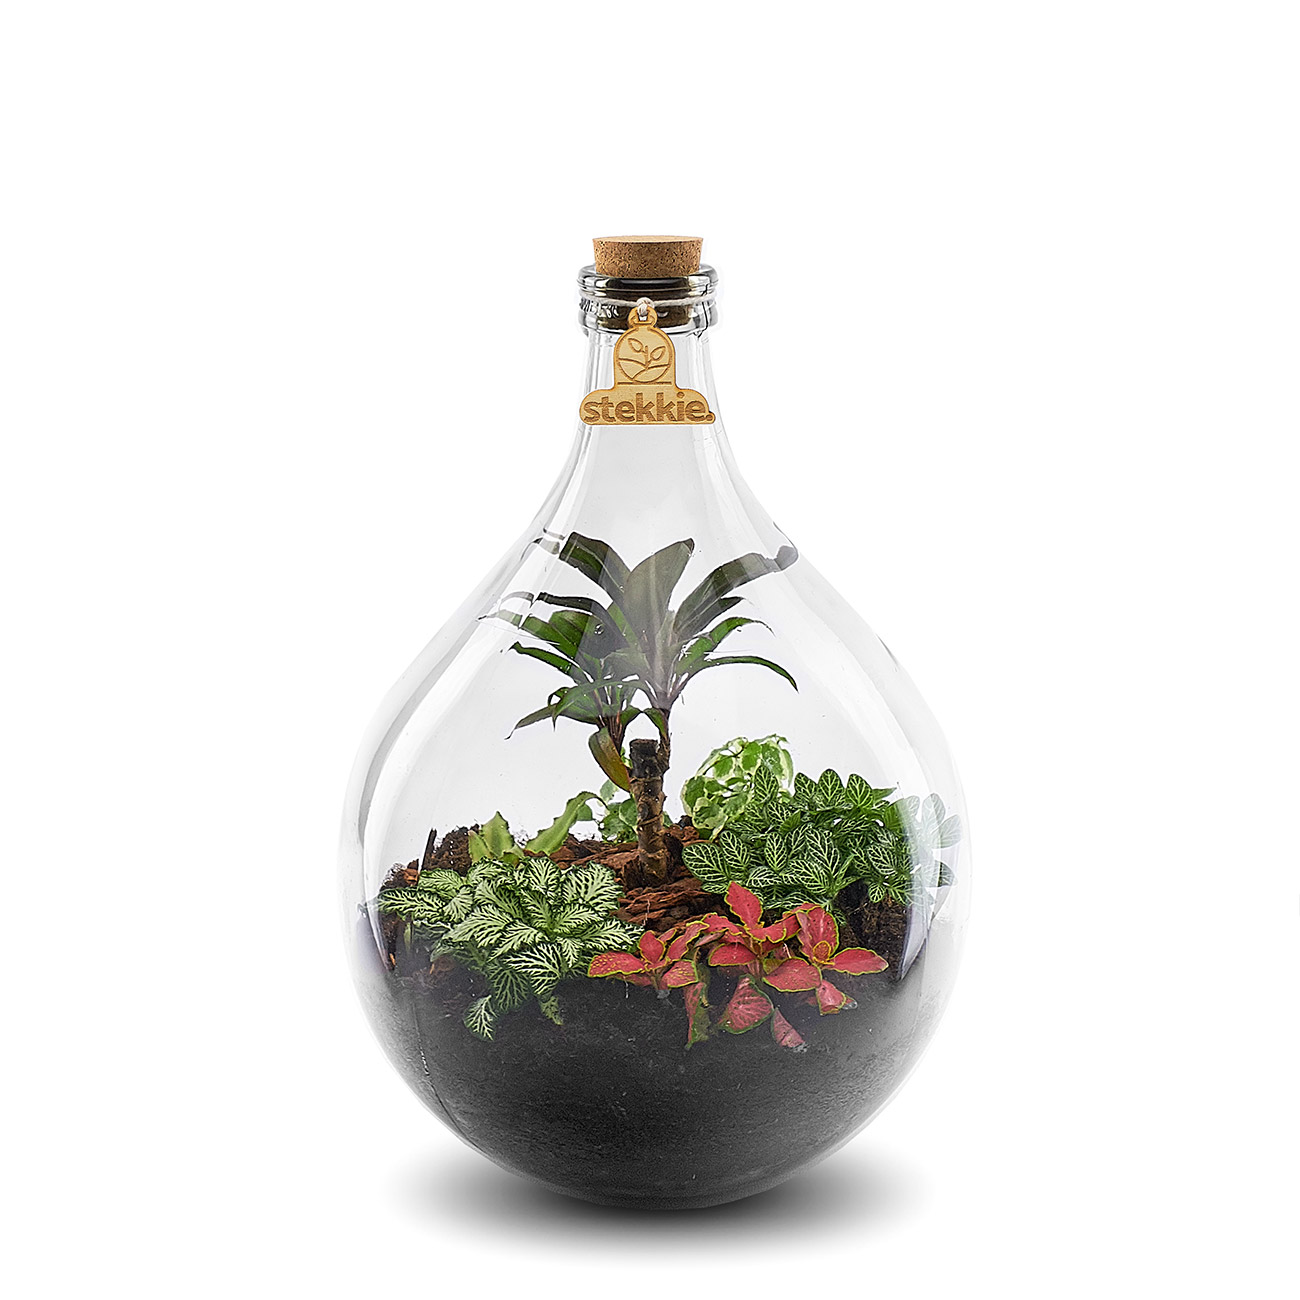 stekkie-medium-mini-ecosysteem